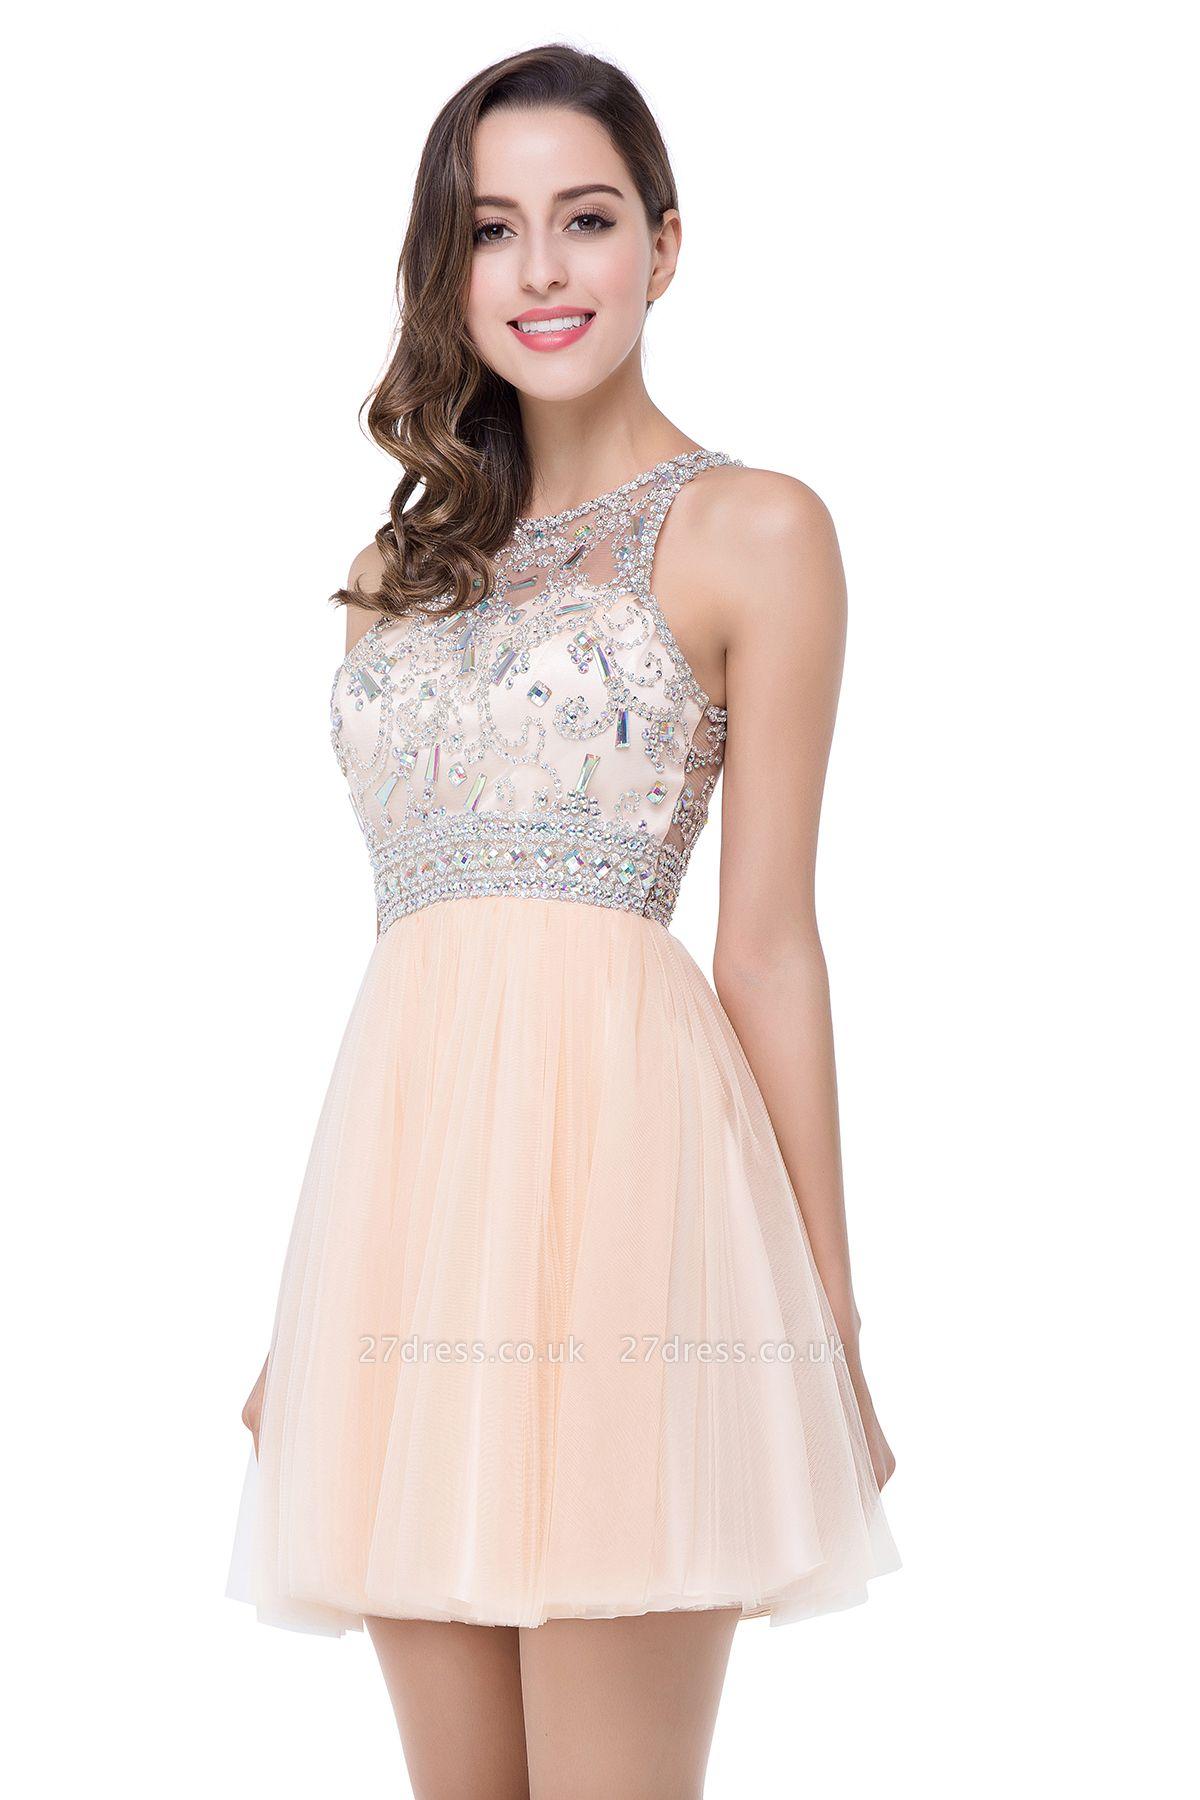 Sexy Beadings Crystal Short Prom Dress UK Chiffon Homecoming Gown